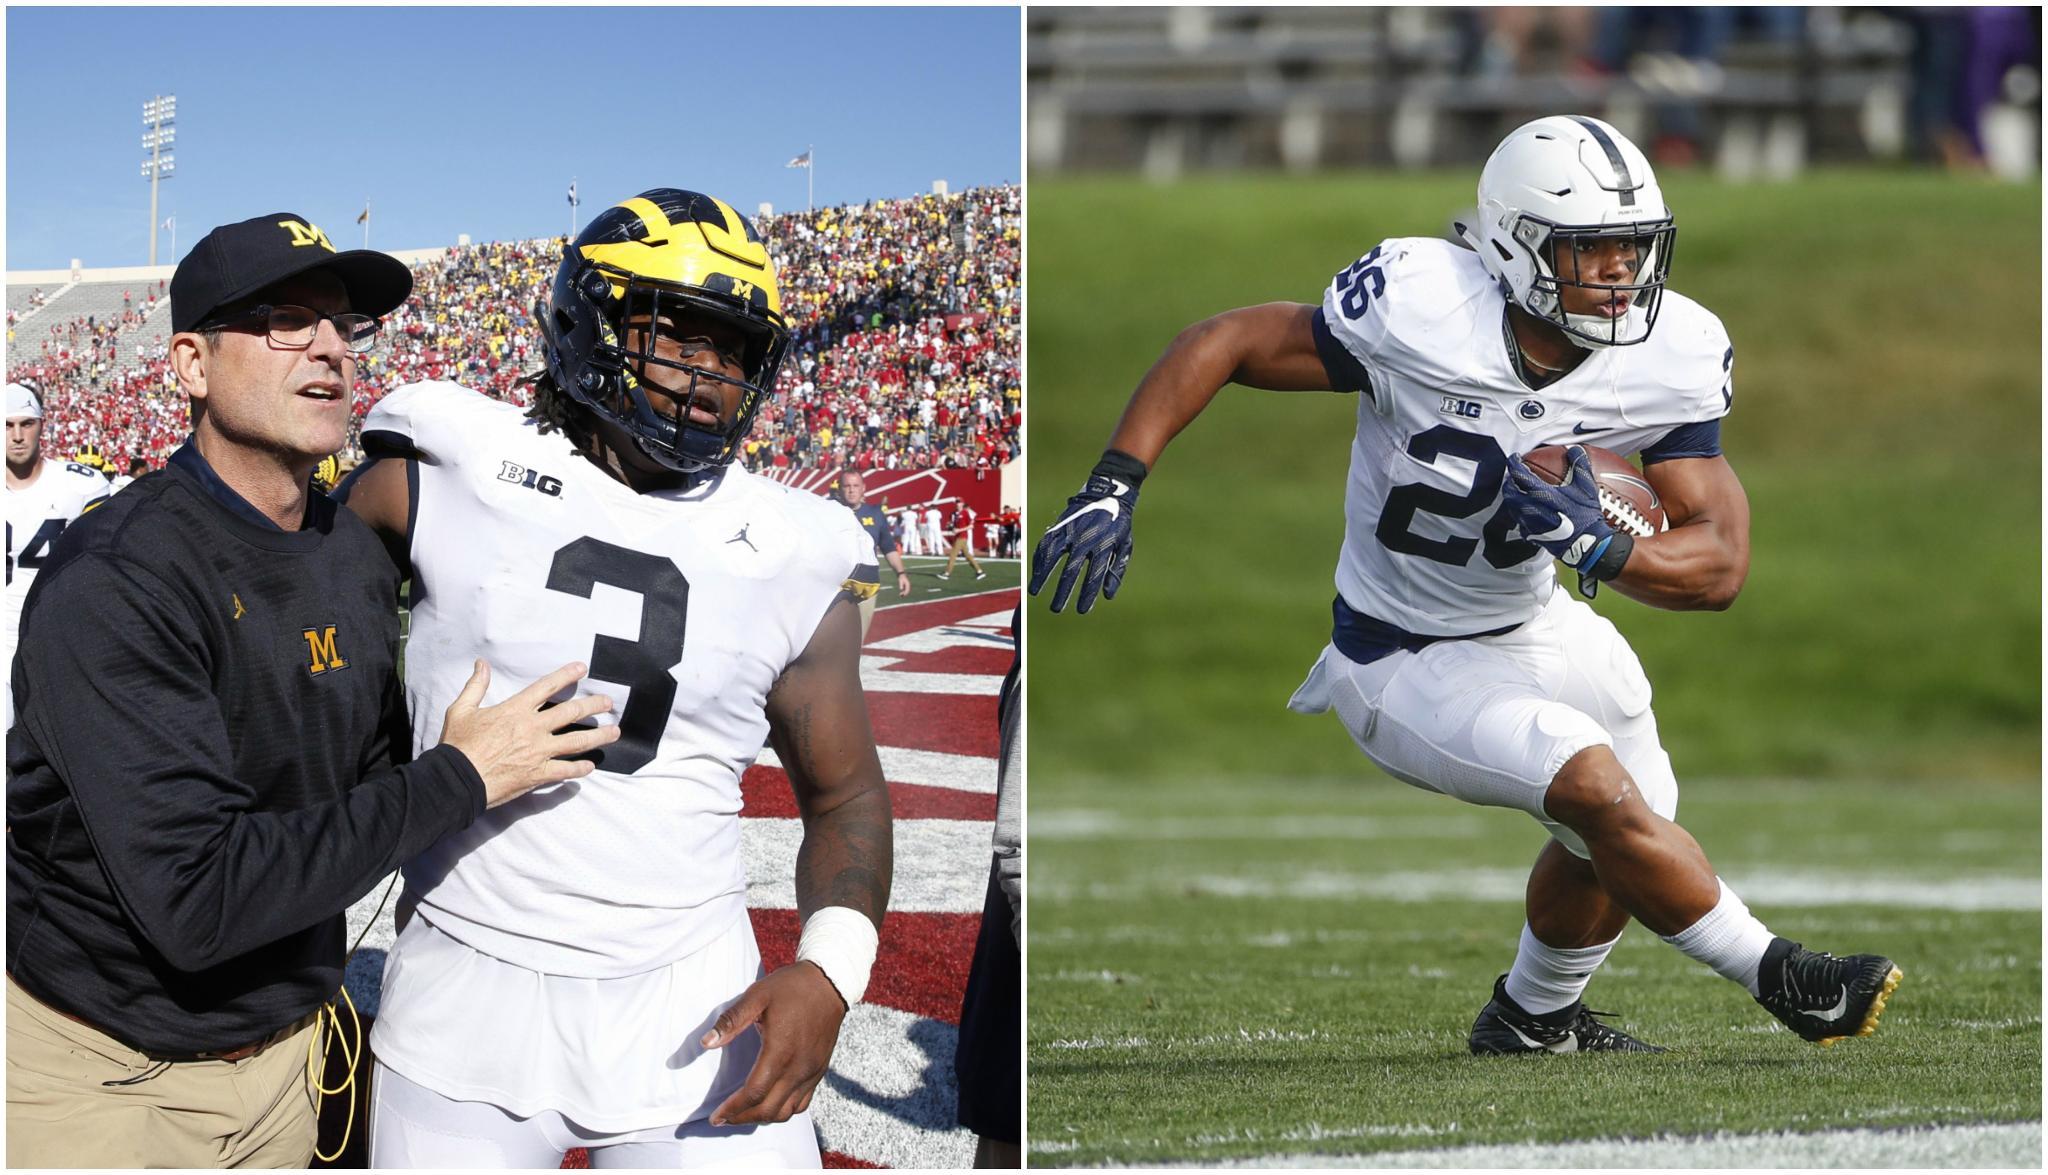 Penn State tenta evitar repetir 2016 contra Michigan na semana 8 do college football